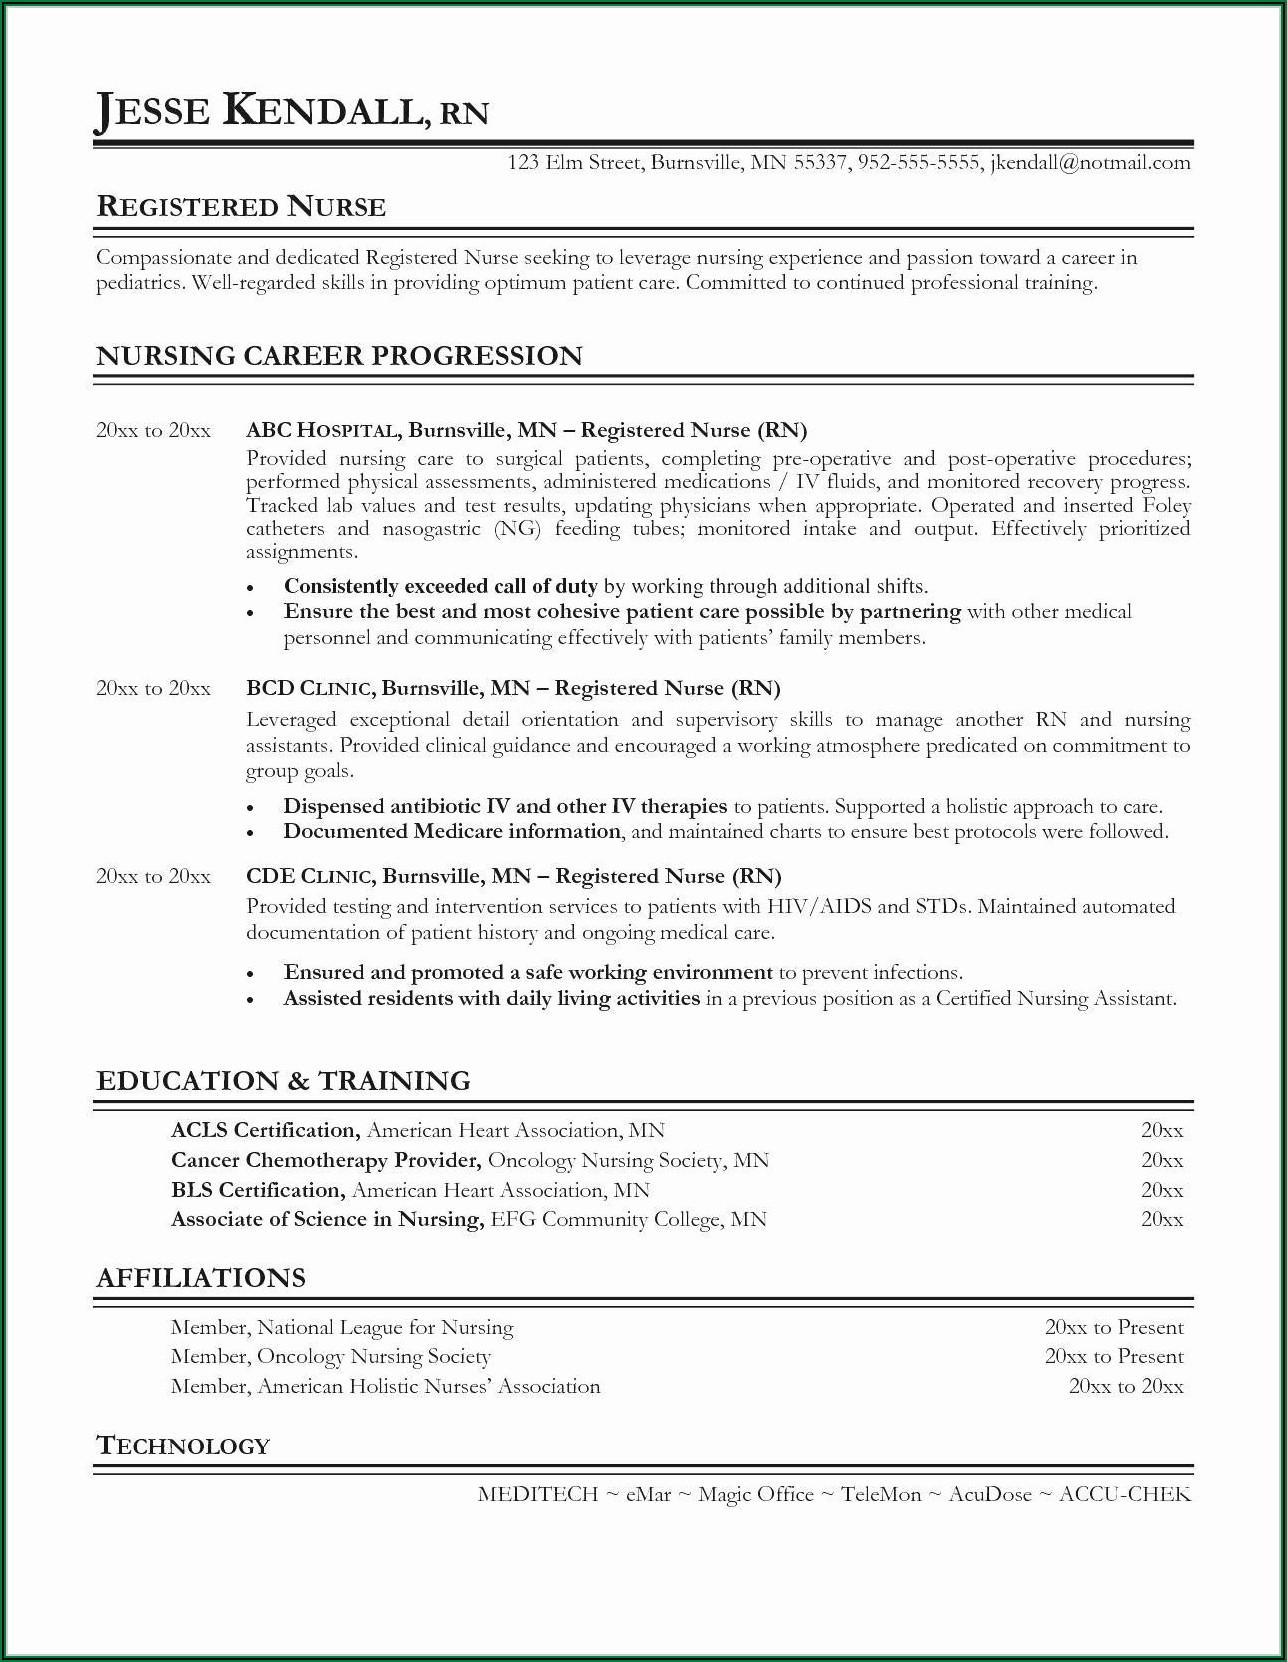 Resume Objective For Certified Nursing Assistant